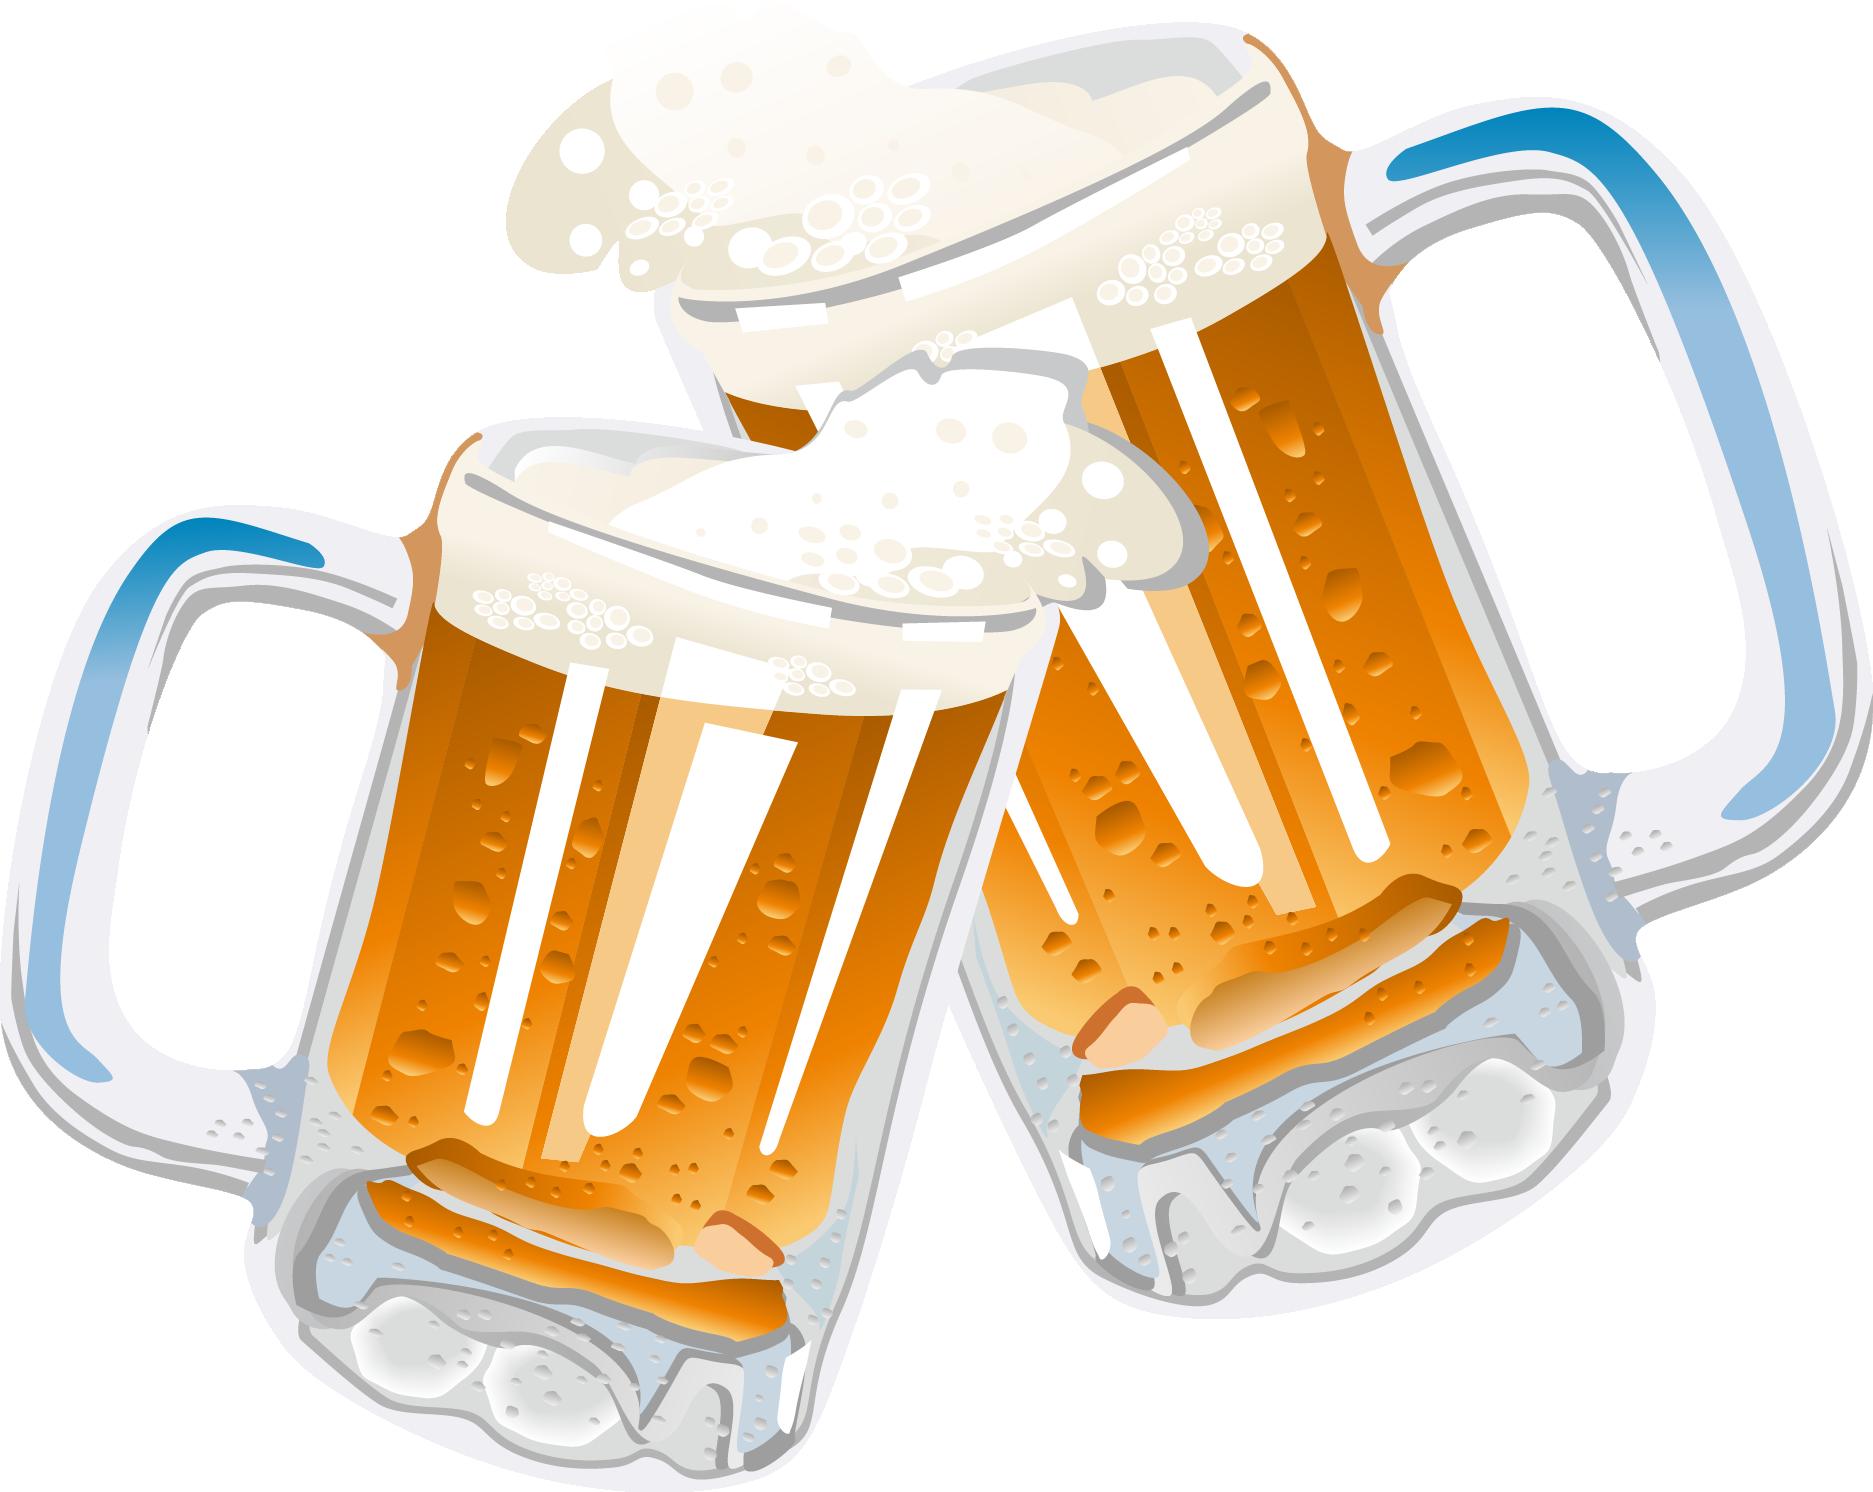 svg transparent Cheers clipart beer food. Glassware drink clip art.